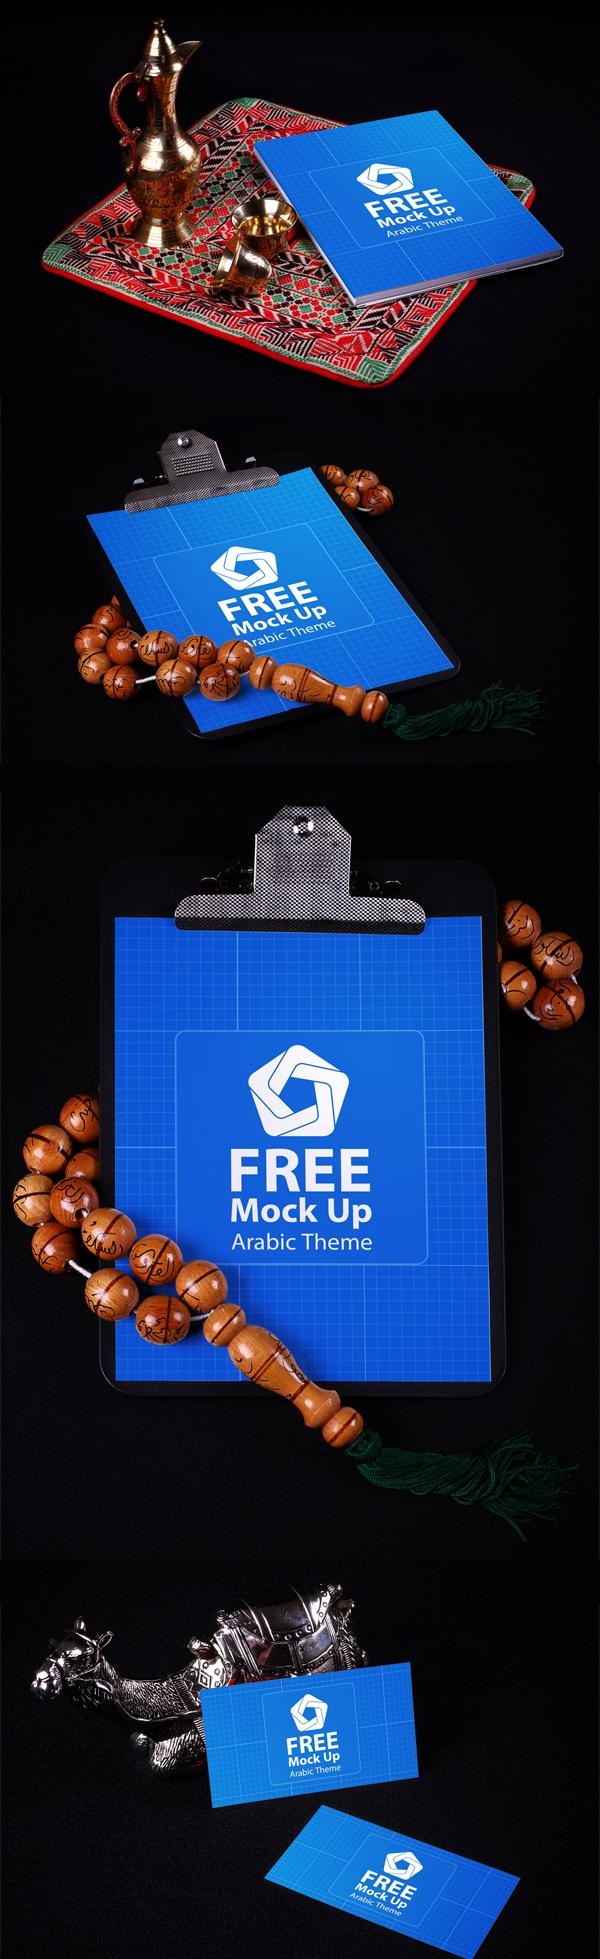 Free Arabic MockUp PSD Template